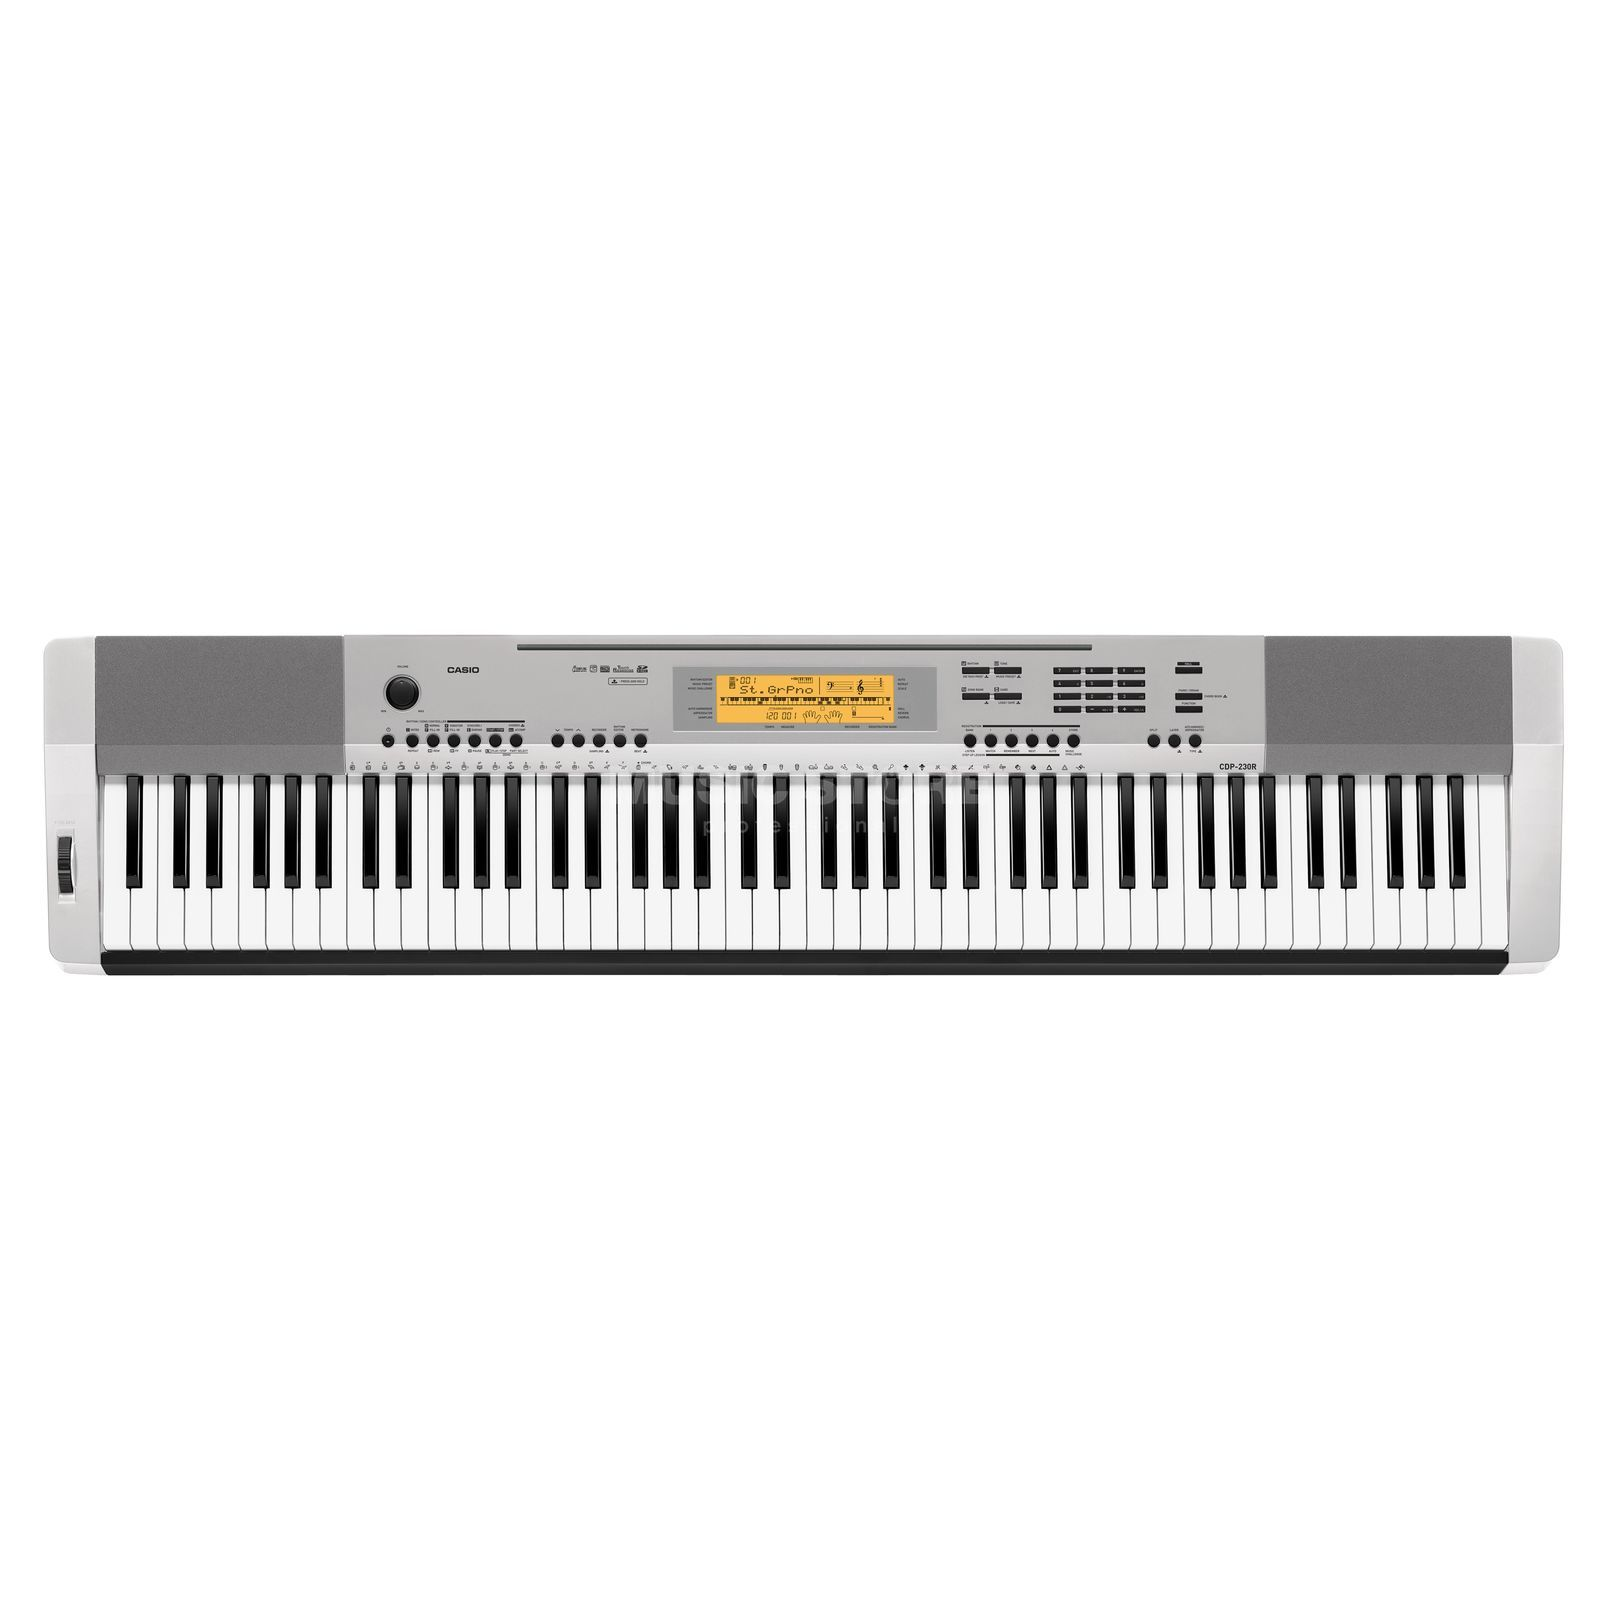 Digital Piano Casio Cdp 230 : casio cdp 230 r sr digital piano silver ~ Vivirlamusica.com Haus und Dekorationen